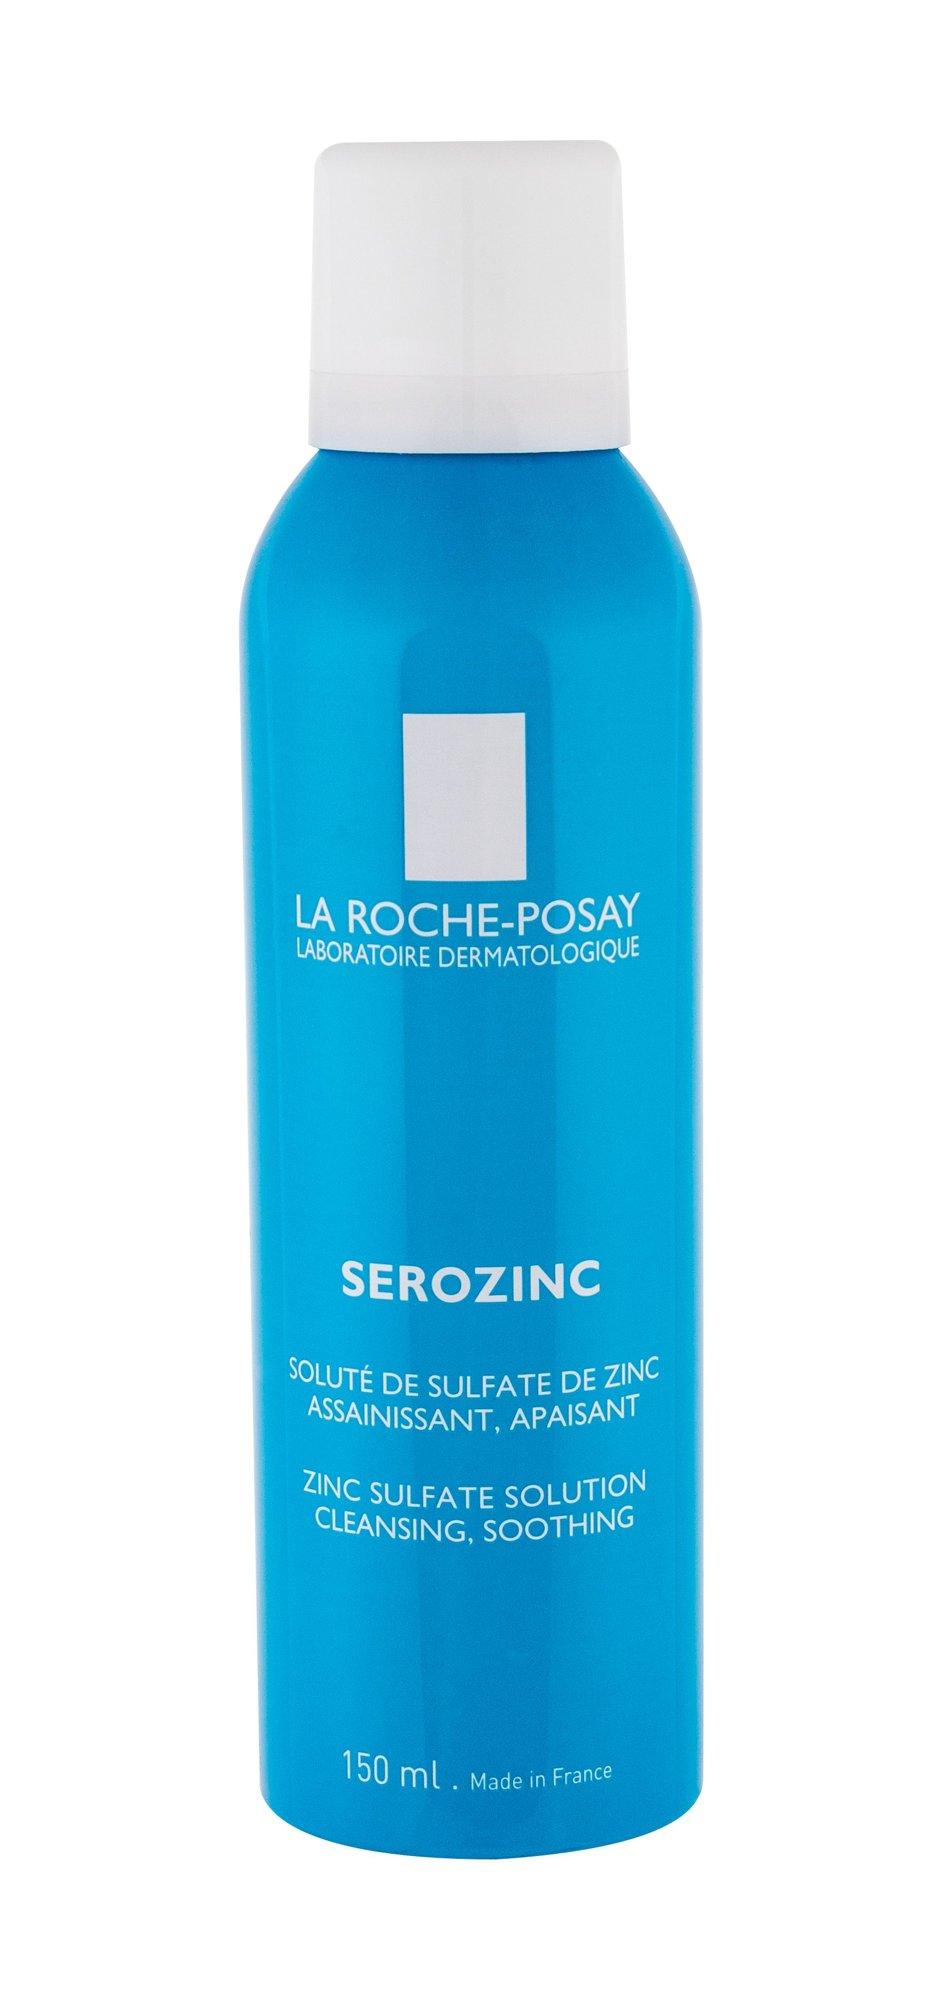 La Roche-Posay Serozinc Facial Lotion 150ml